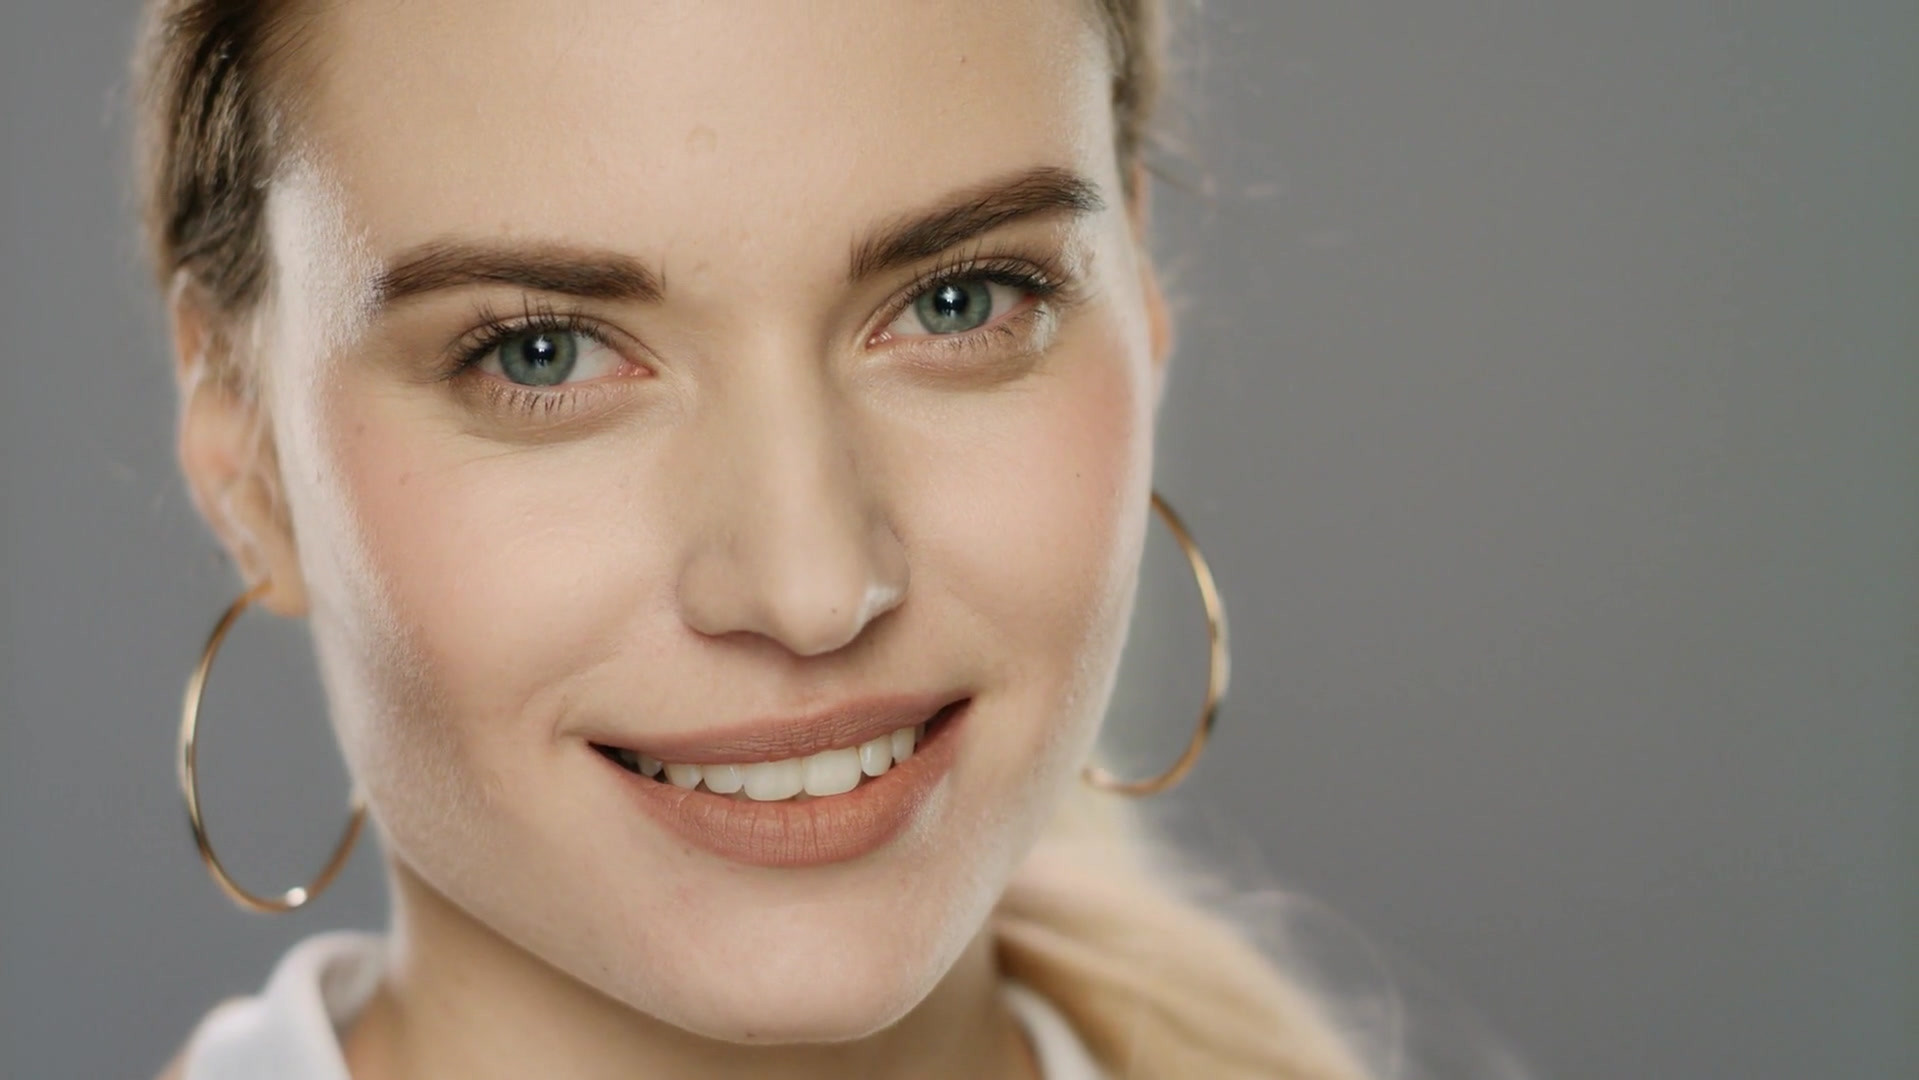 videoblocks-portrait-of-happy-woman-smil